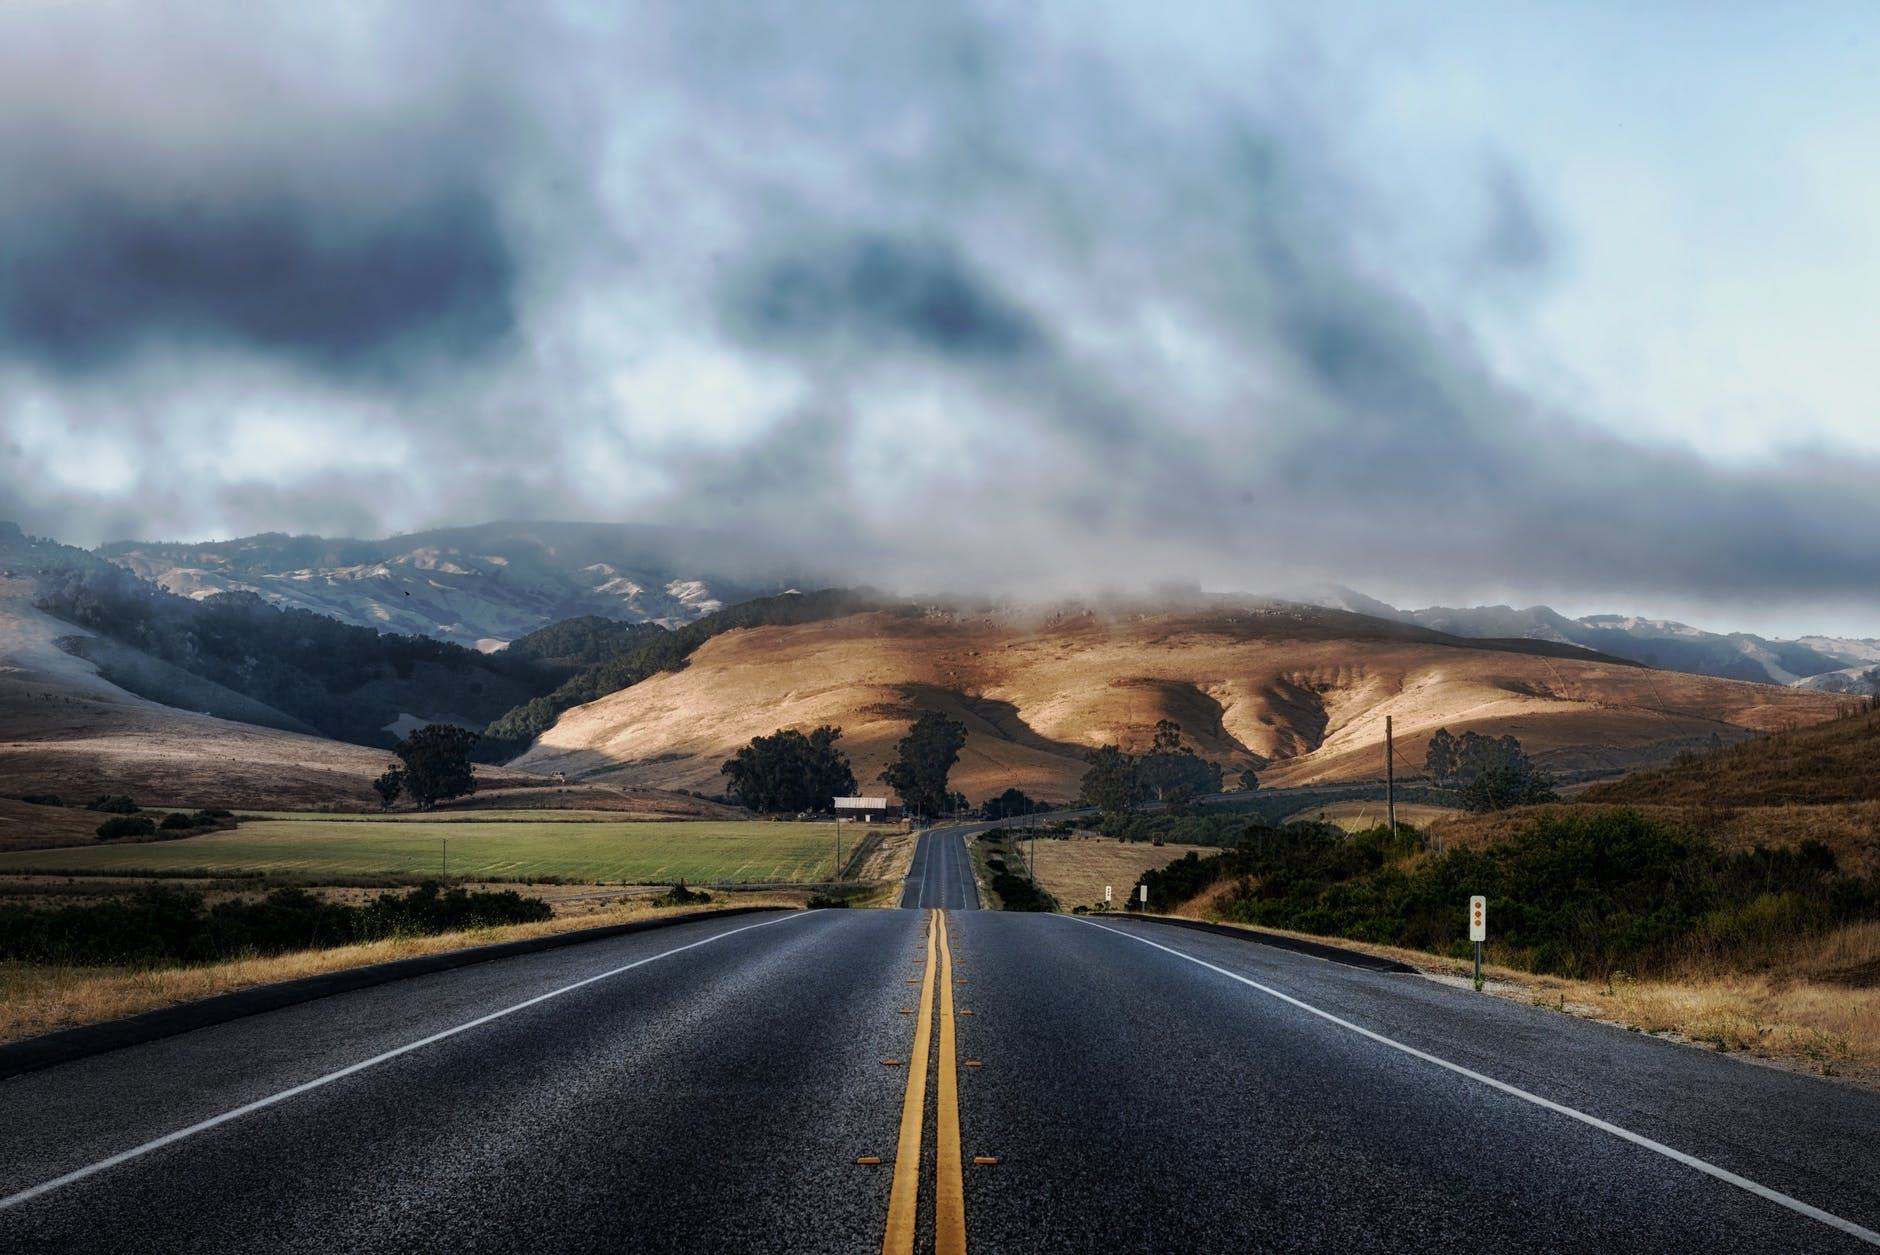 california-road-highway-mountains-63324.jpeg